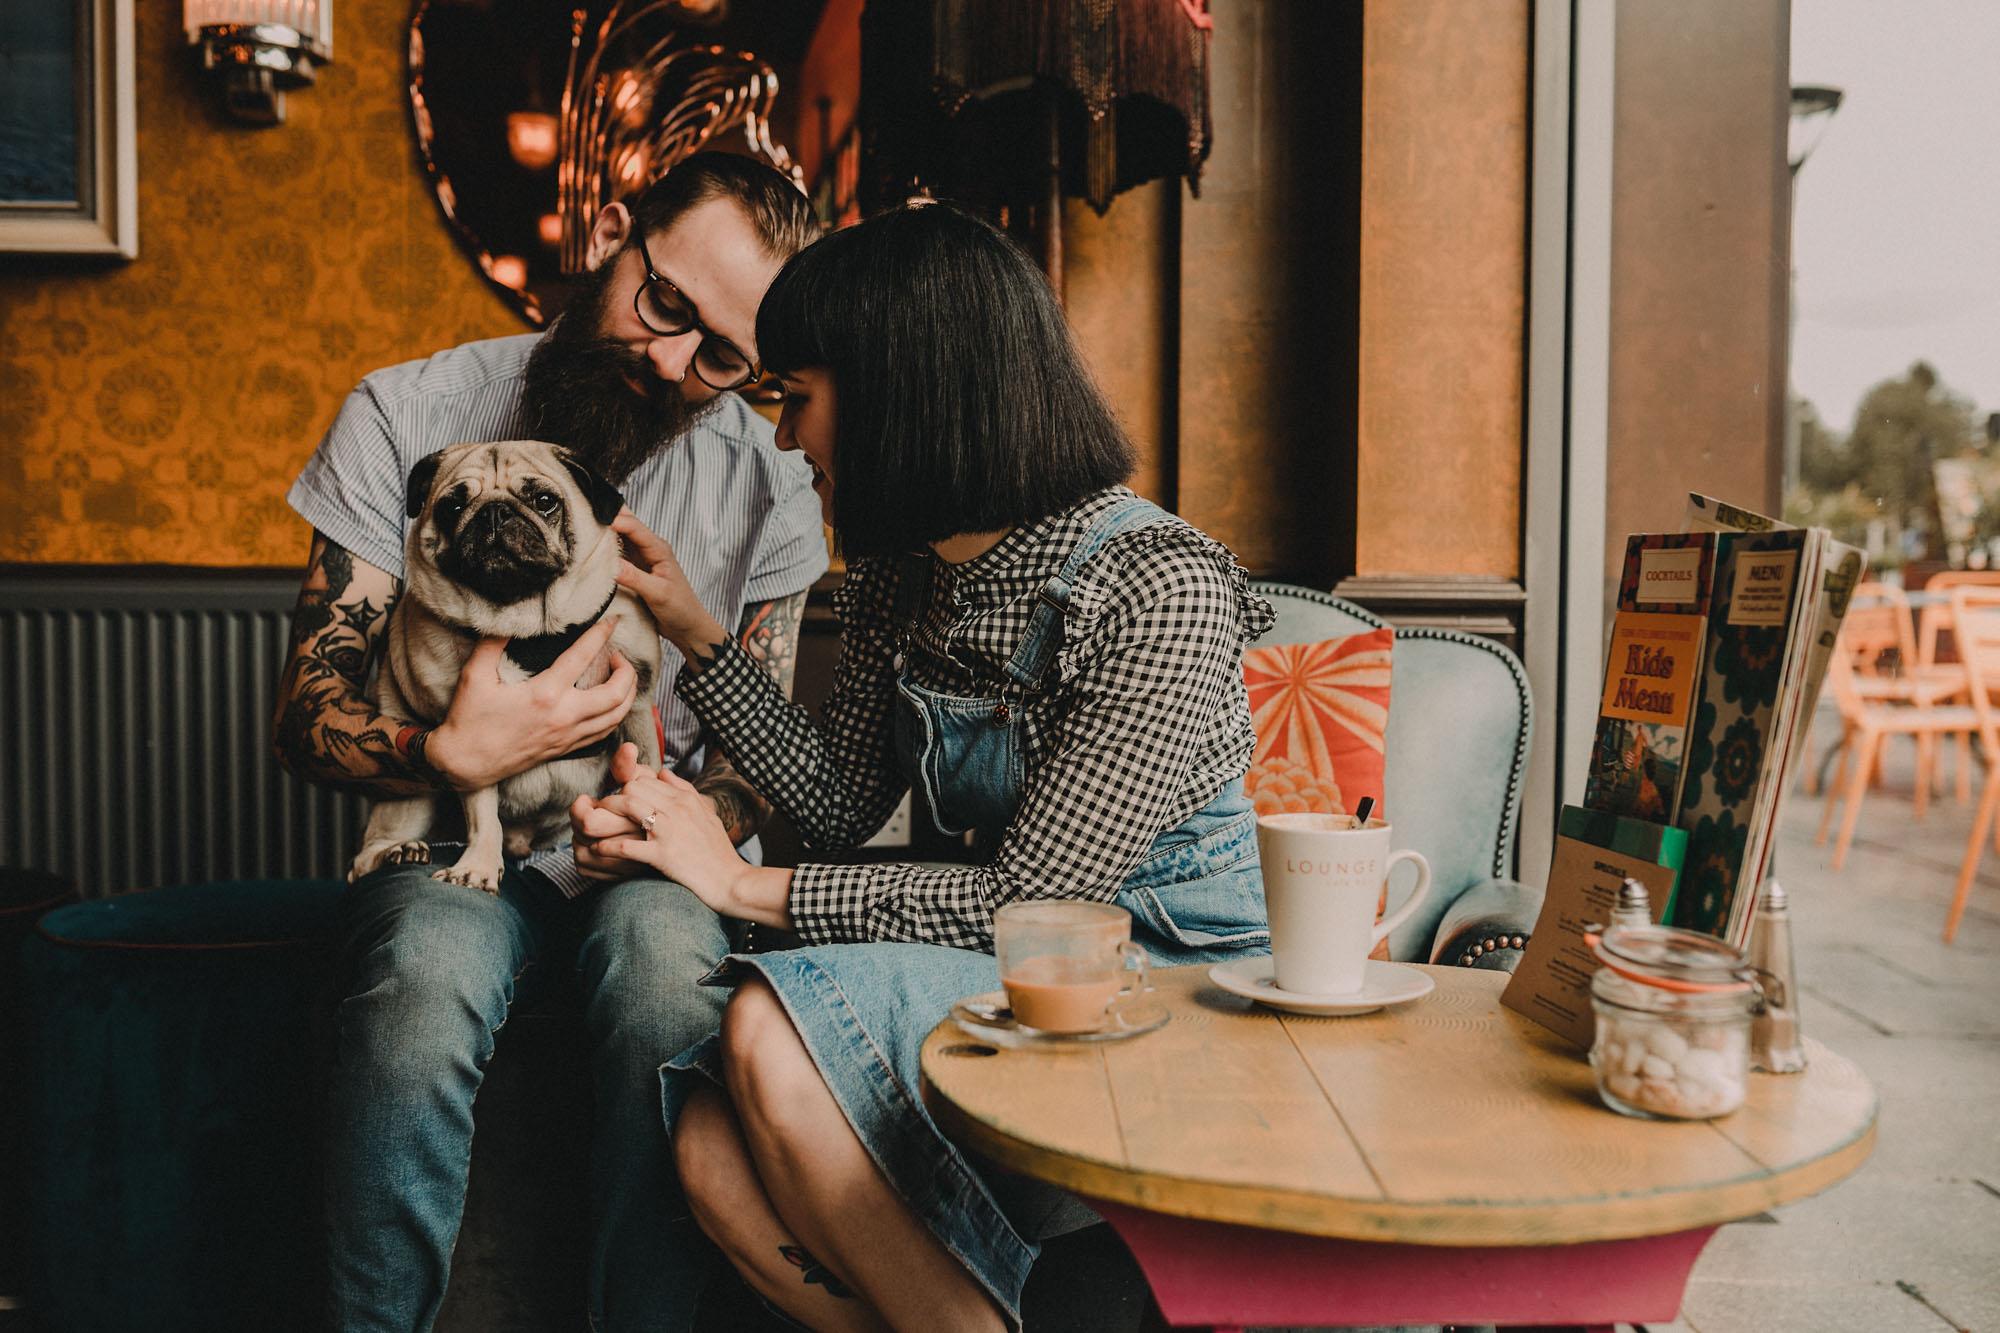 Cafe-Bar-Engagement-Photography8.jpg